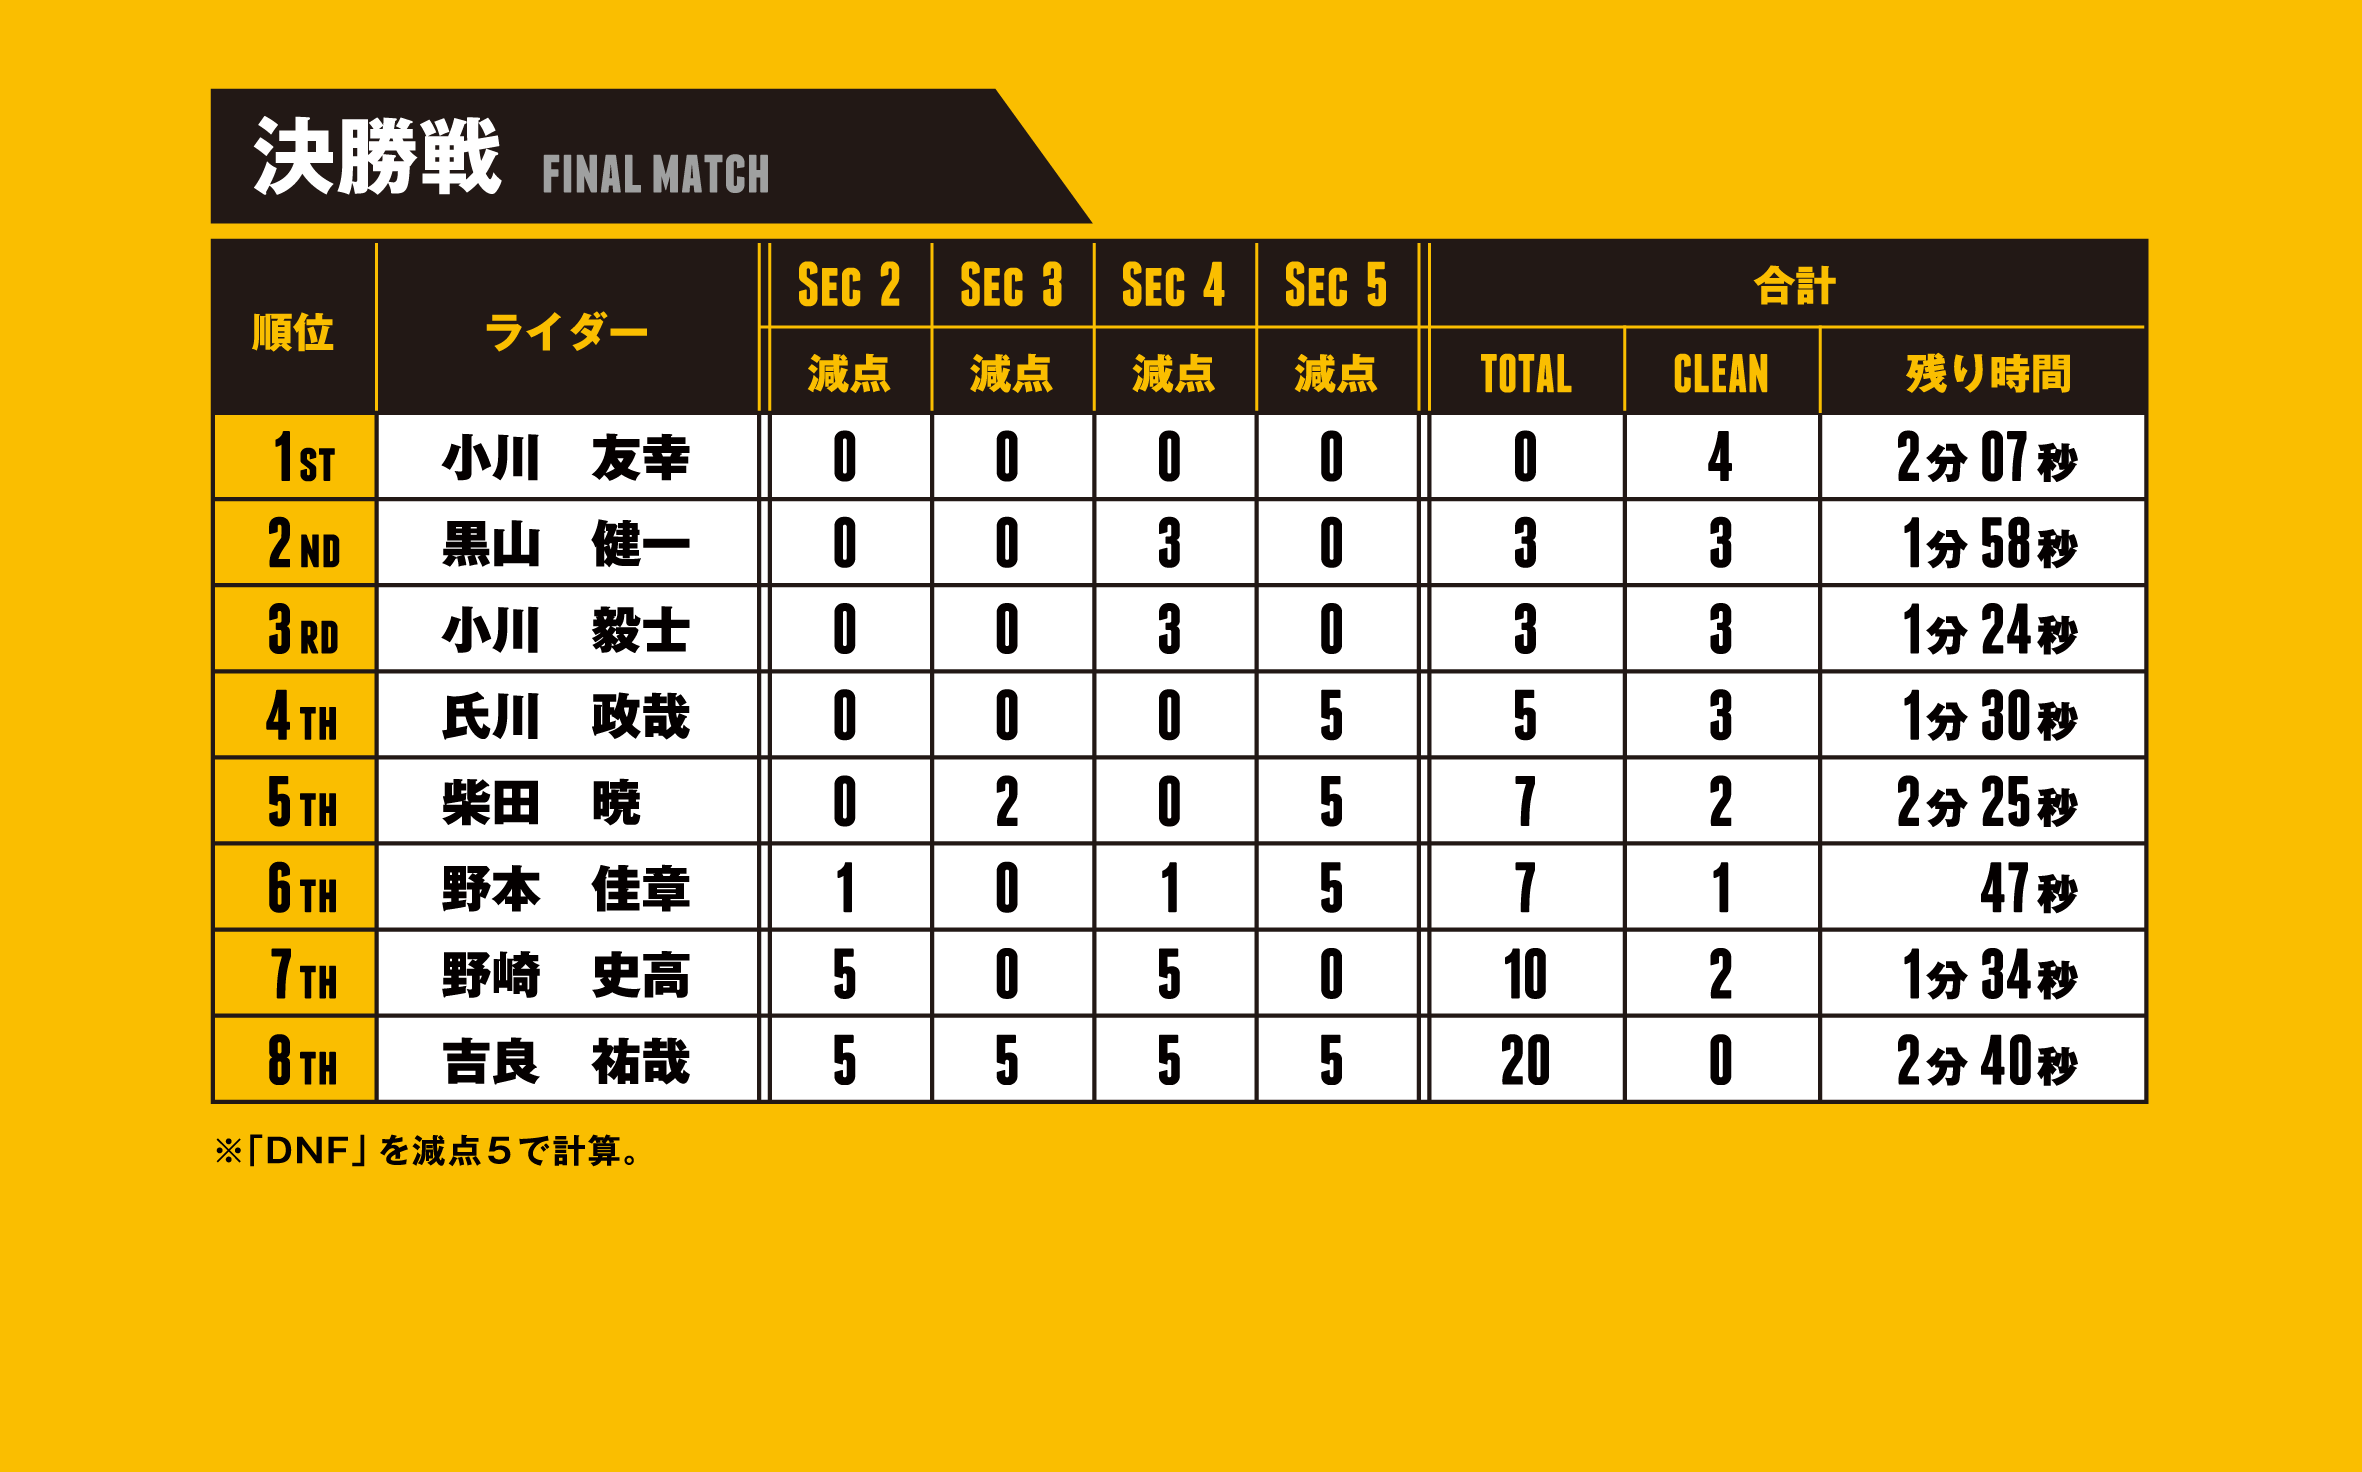 ctj2018 final match